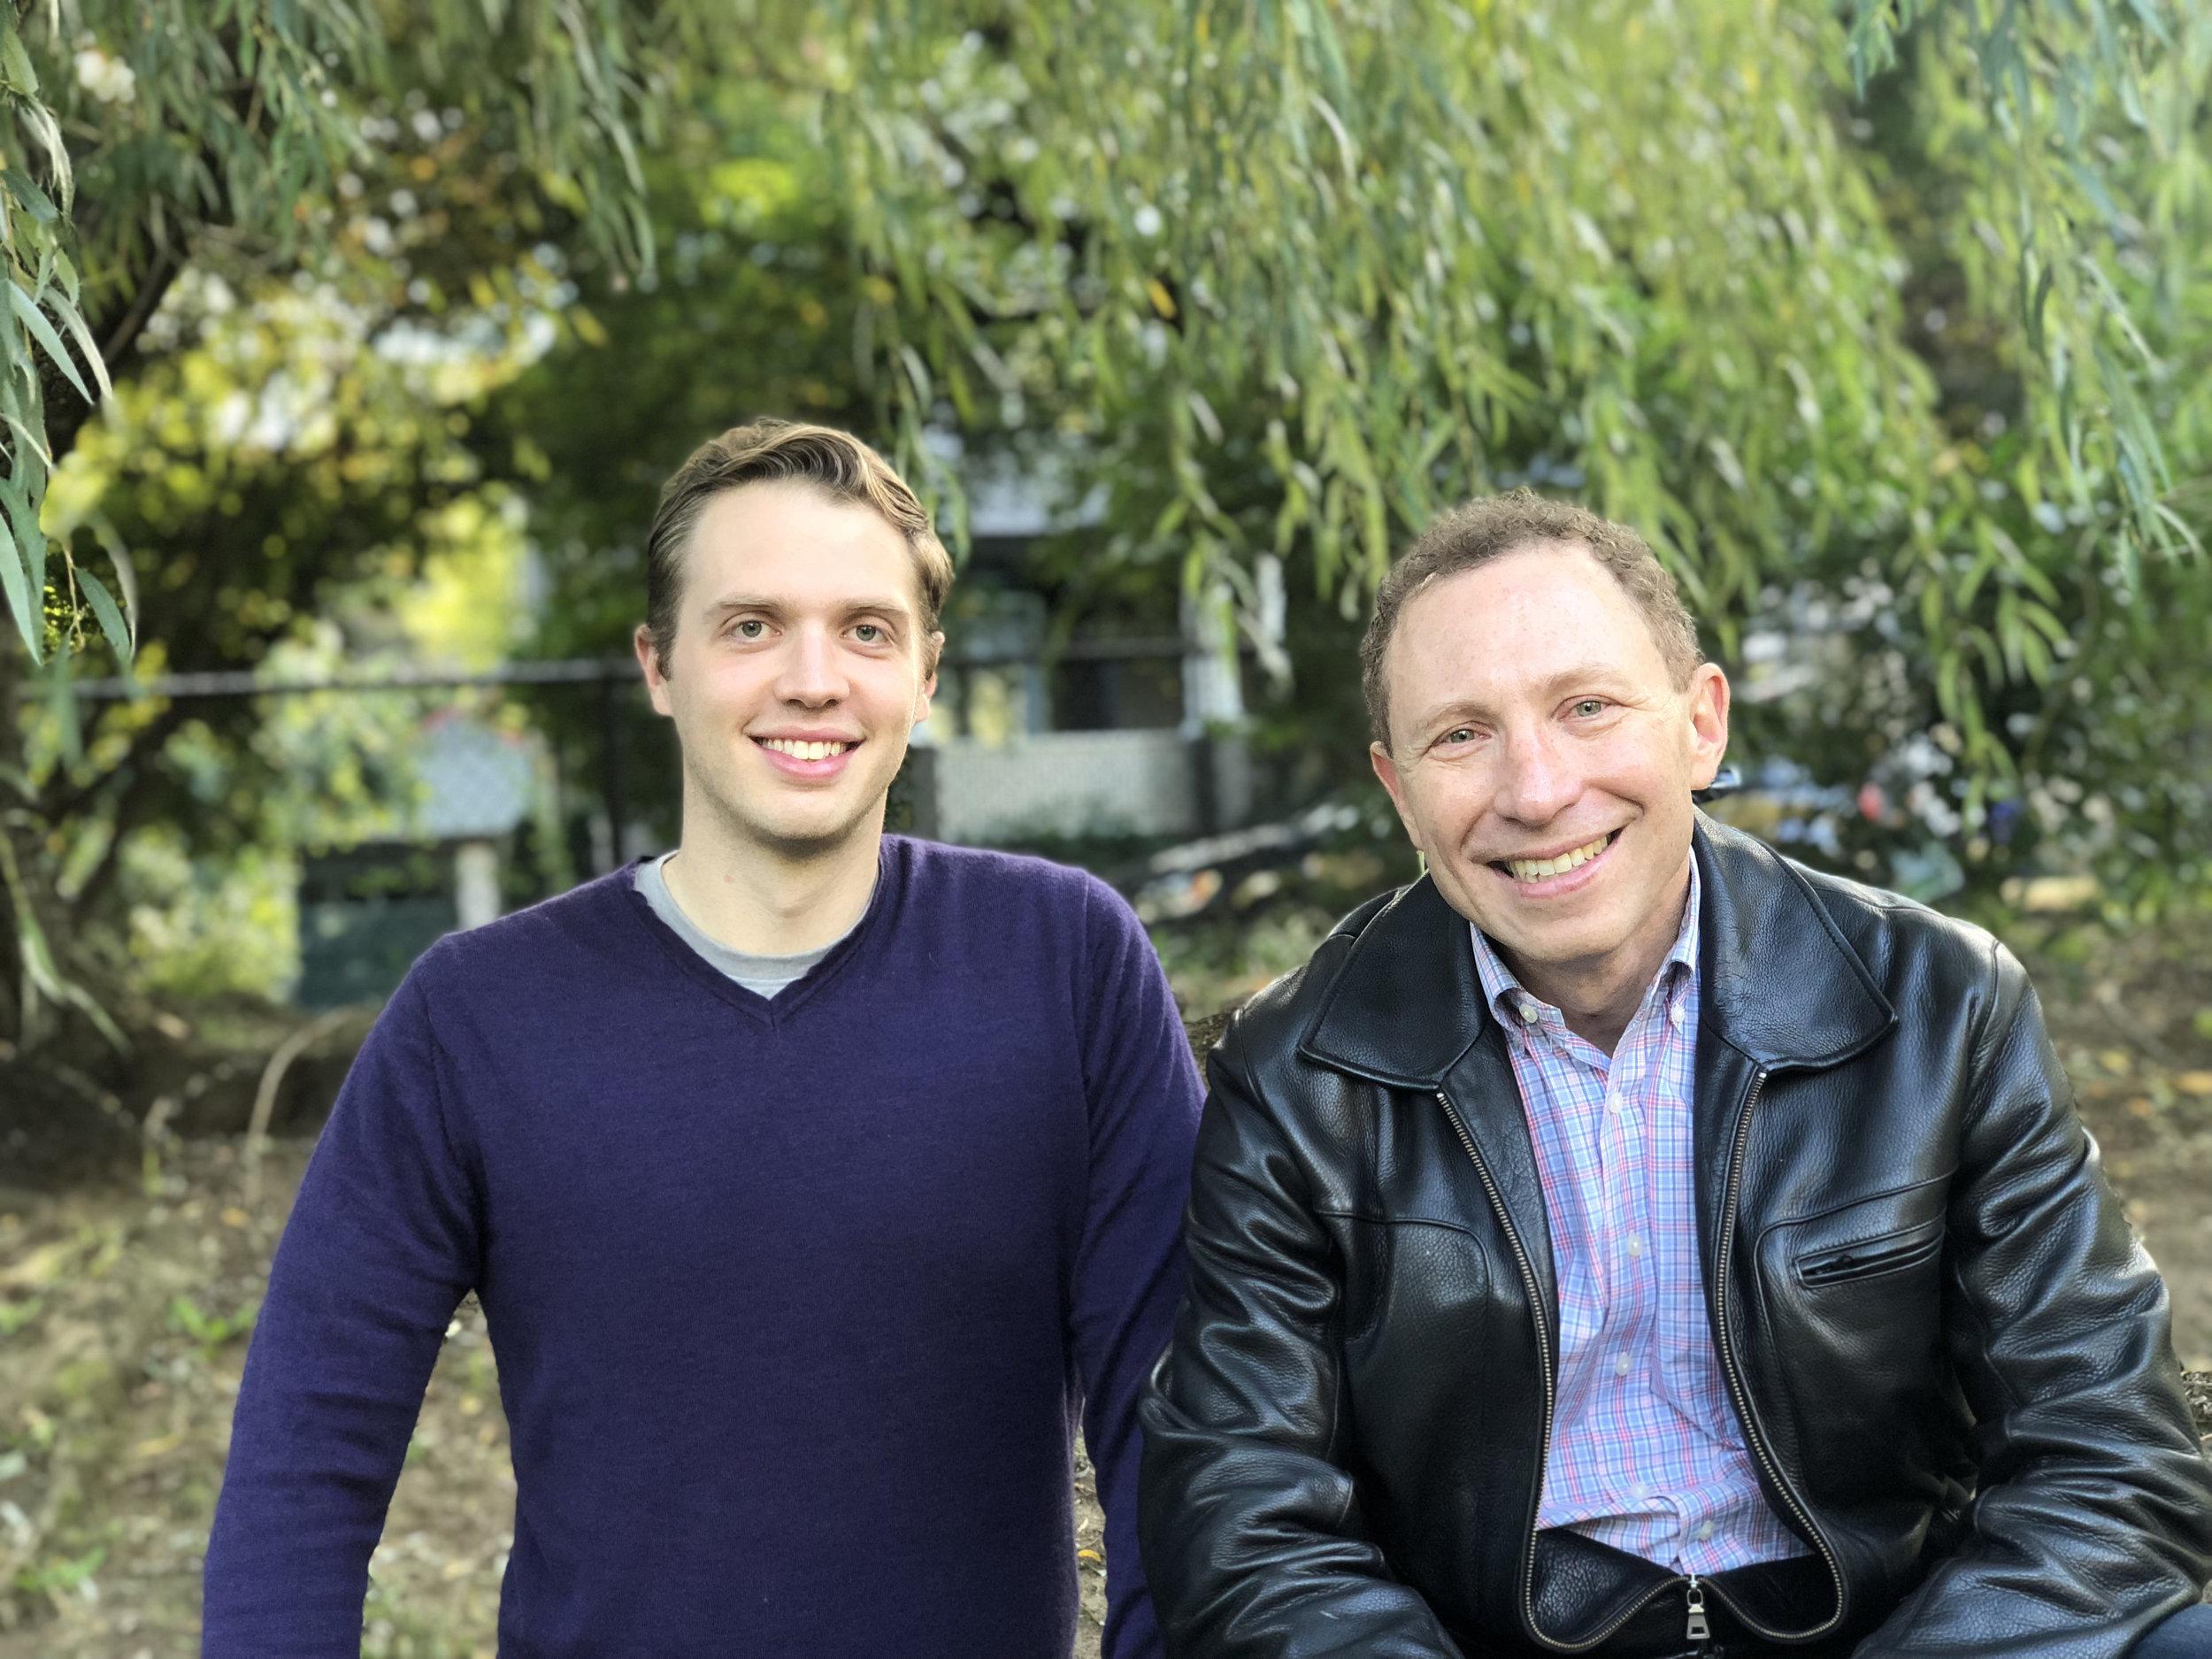 Ryan Stelzer & David Brendel MD, PhD; Co-authors